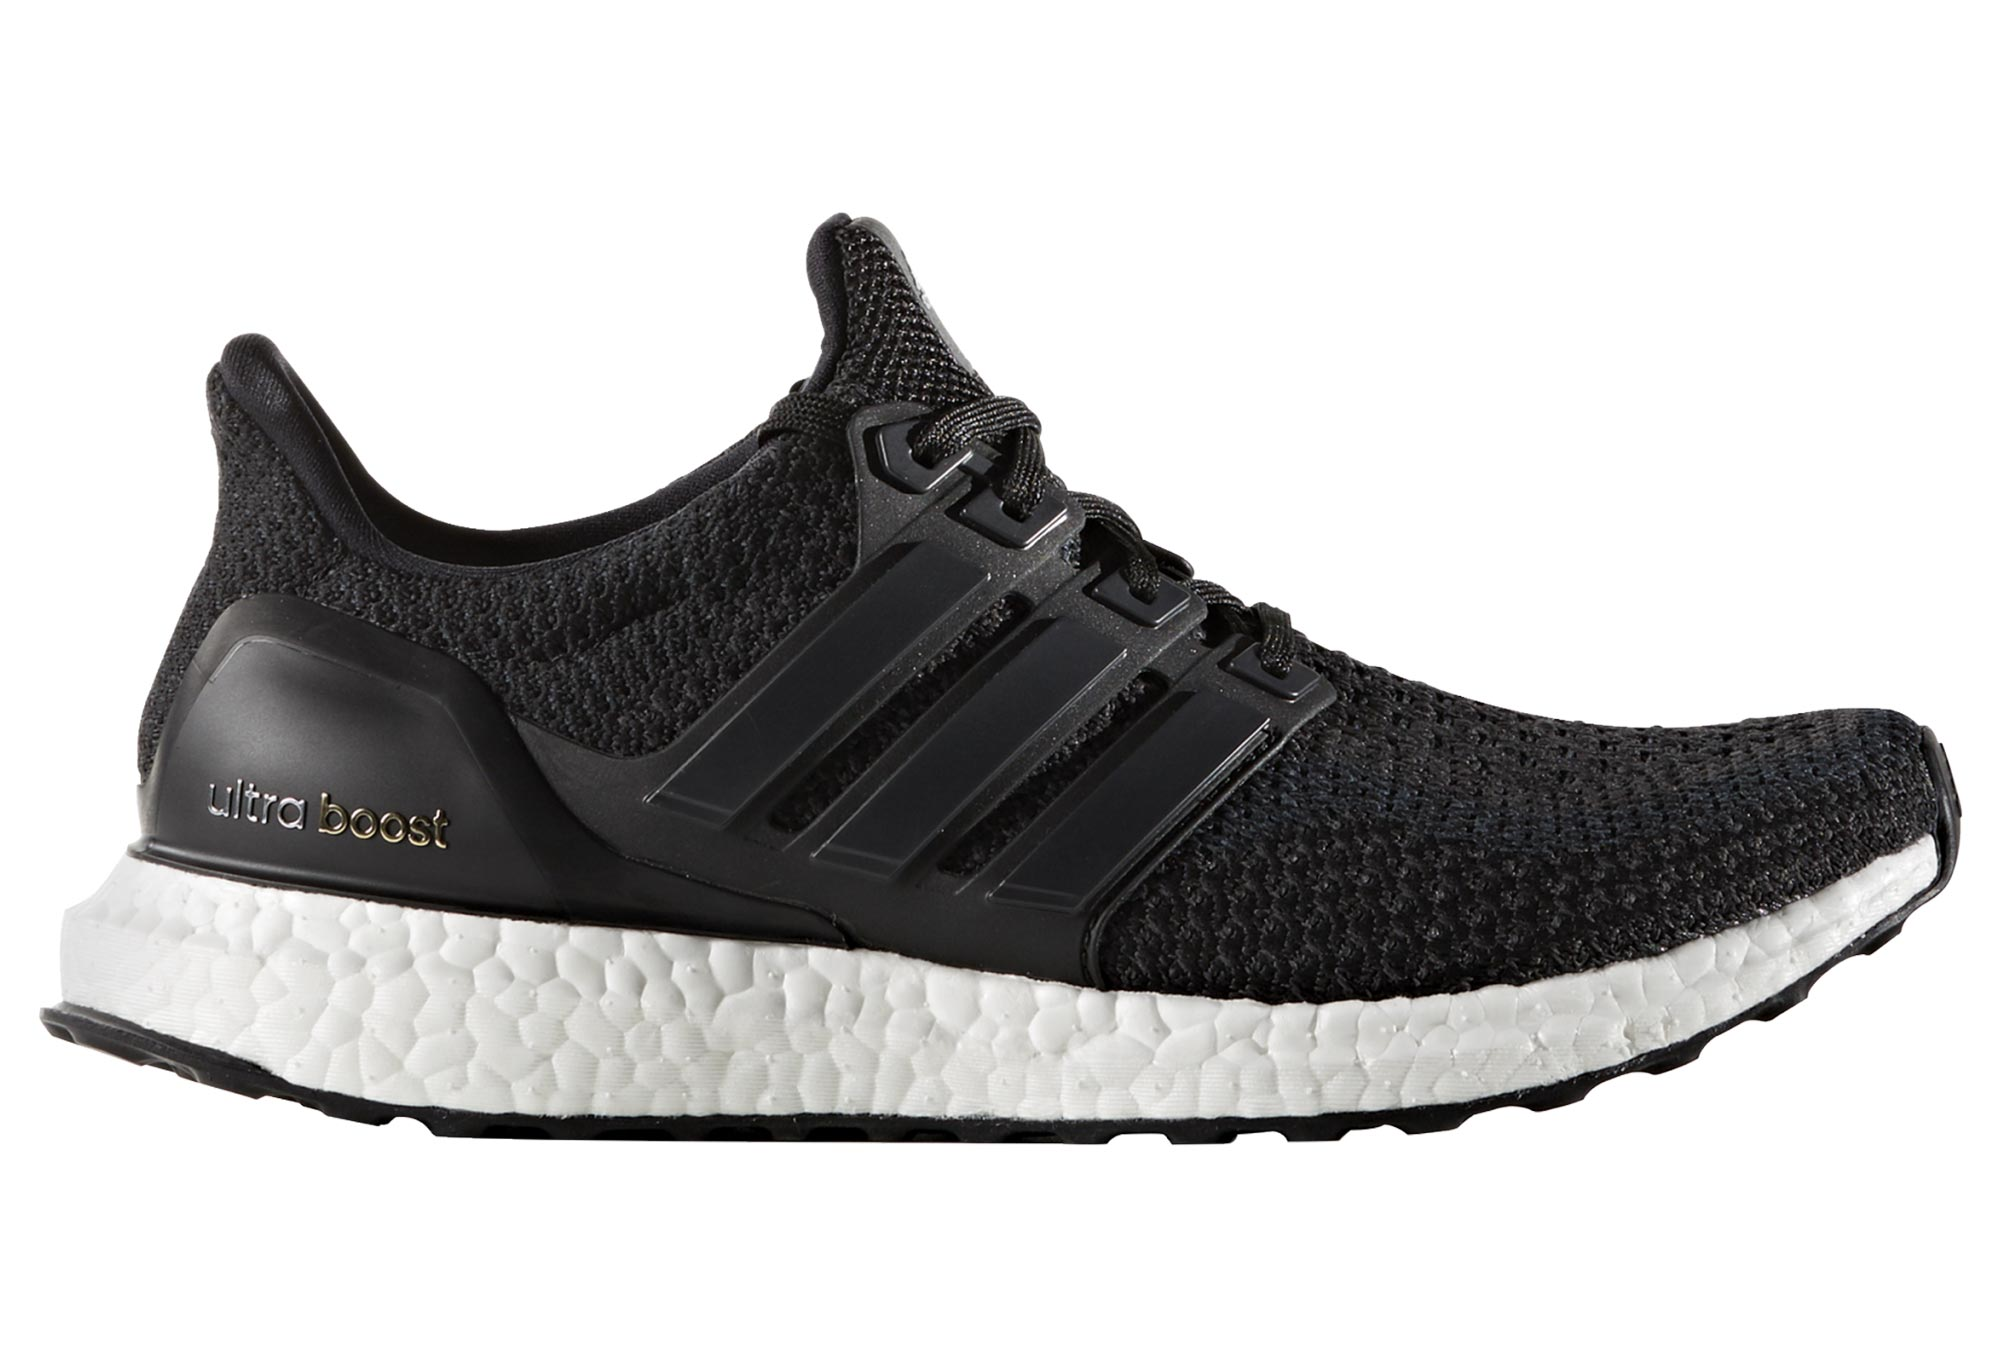 chaussures de running femme adidas running ultra boost n c. Black Bedroom Furniture Sets. Home Design Ideas